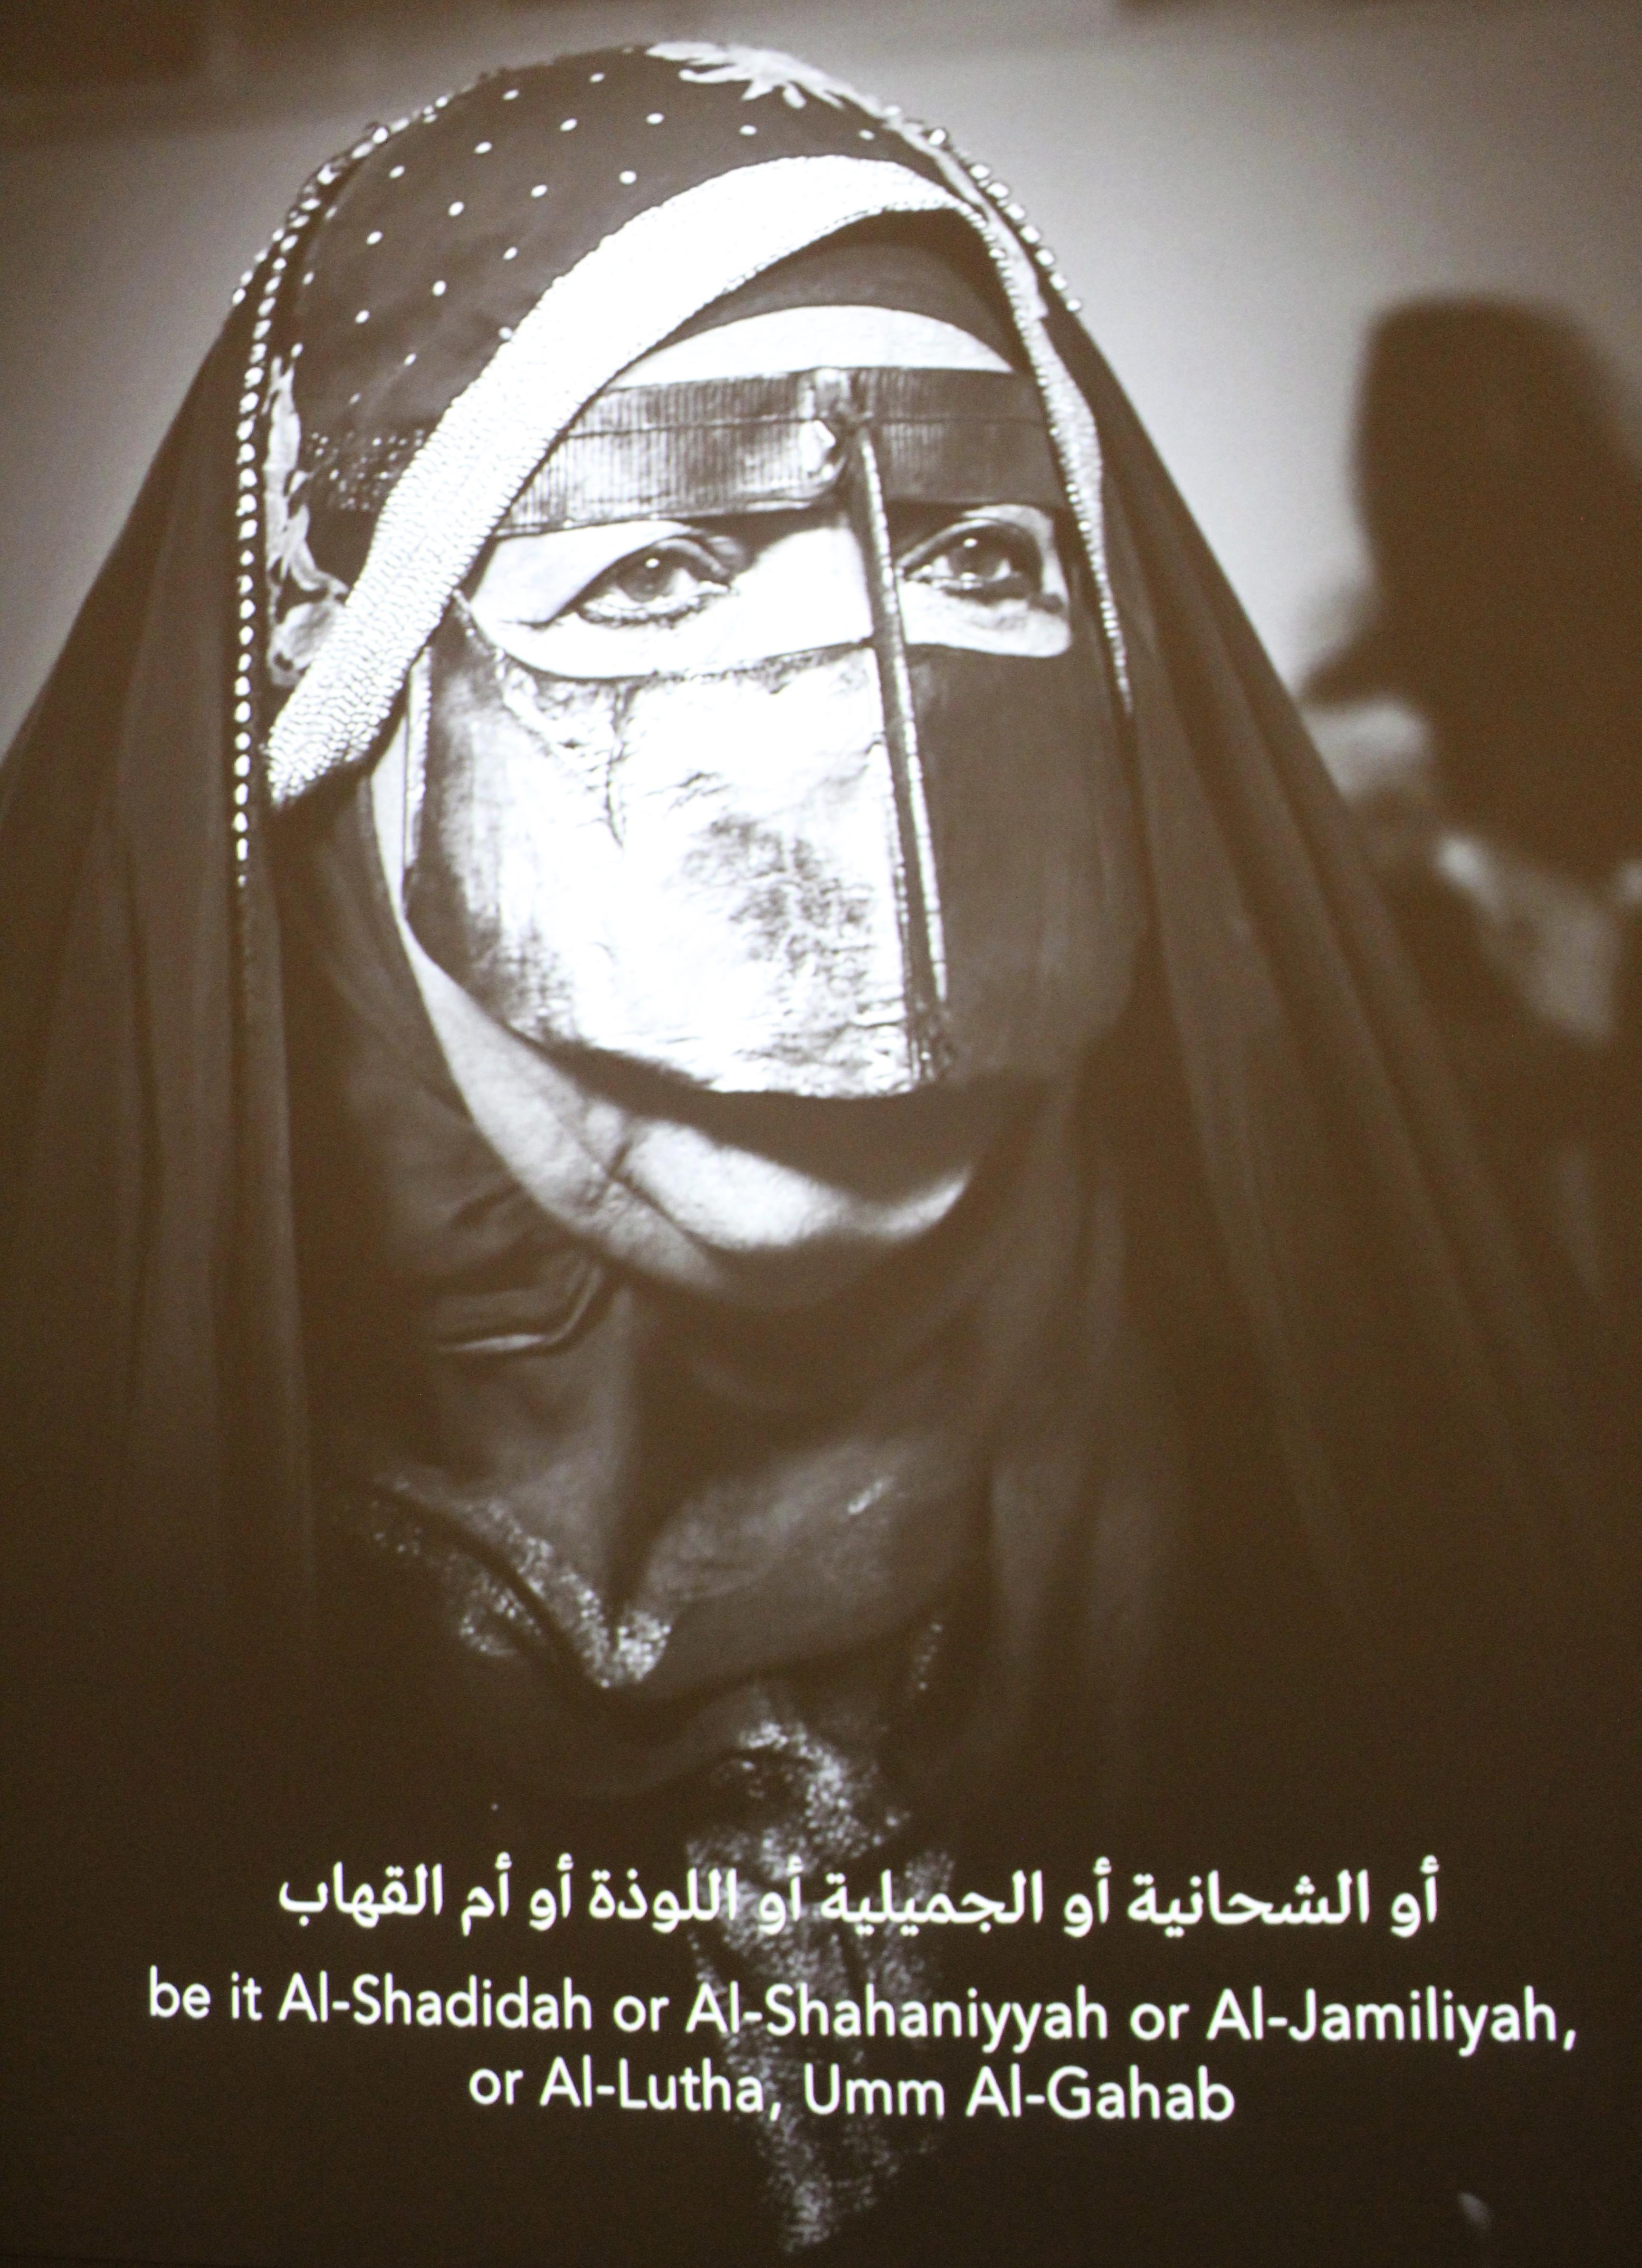 Doha, Qatar - April, 2019 - National Museum of Qatar - Film - History of Qatar - Elder wearing a Battoulah